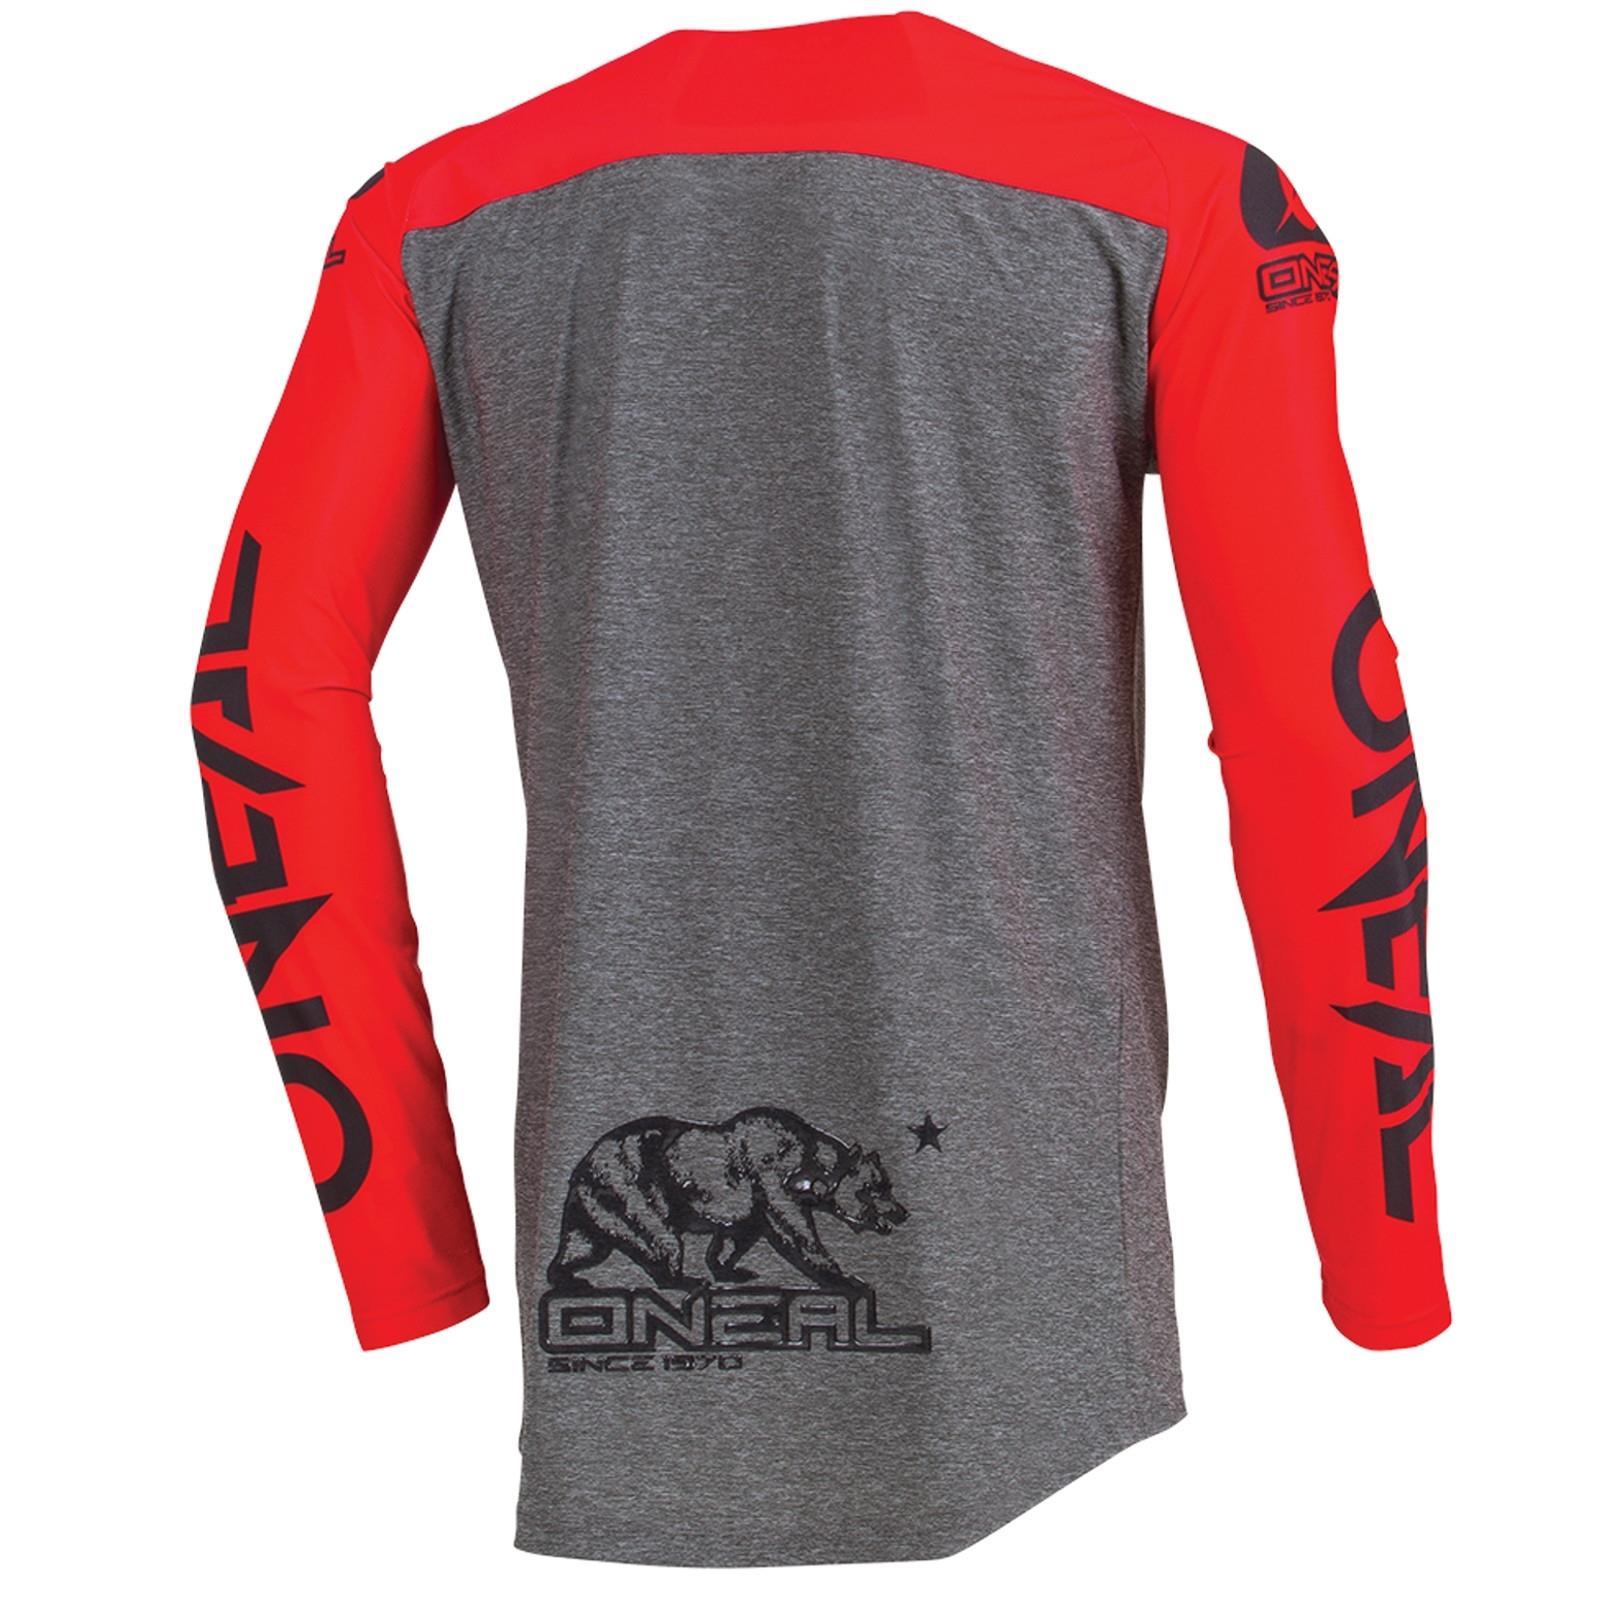 O-039-Neal-elemento-Mayhem-JERSEY-Racewear-Motocross-Maglia-MX-DH-FR-MTB-MOUNTAIN-BIKE miniatura 48